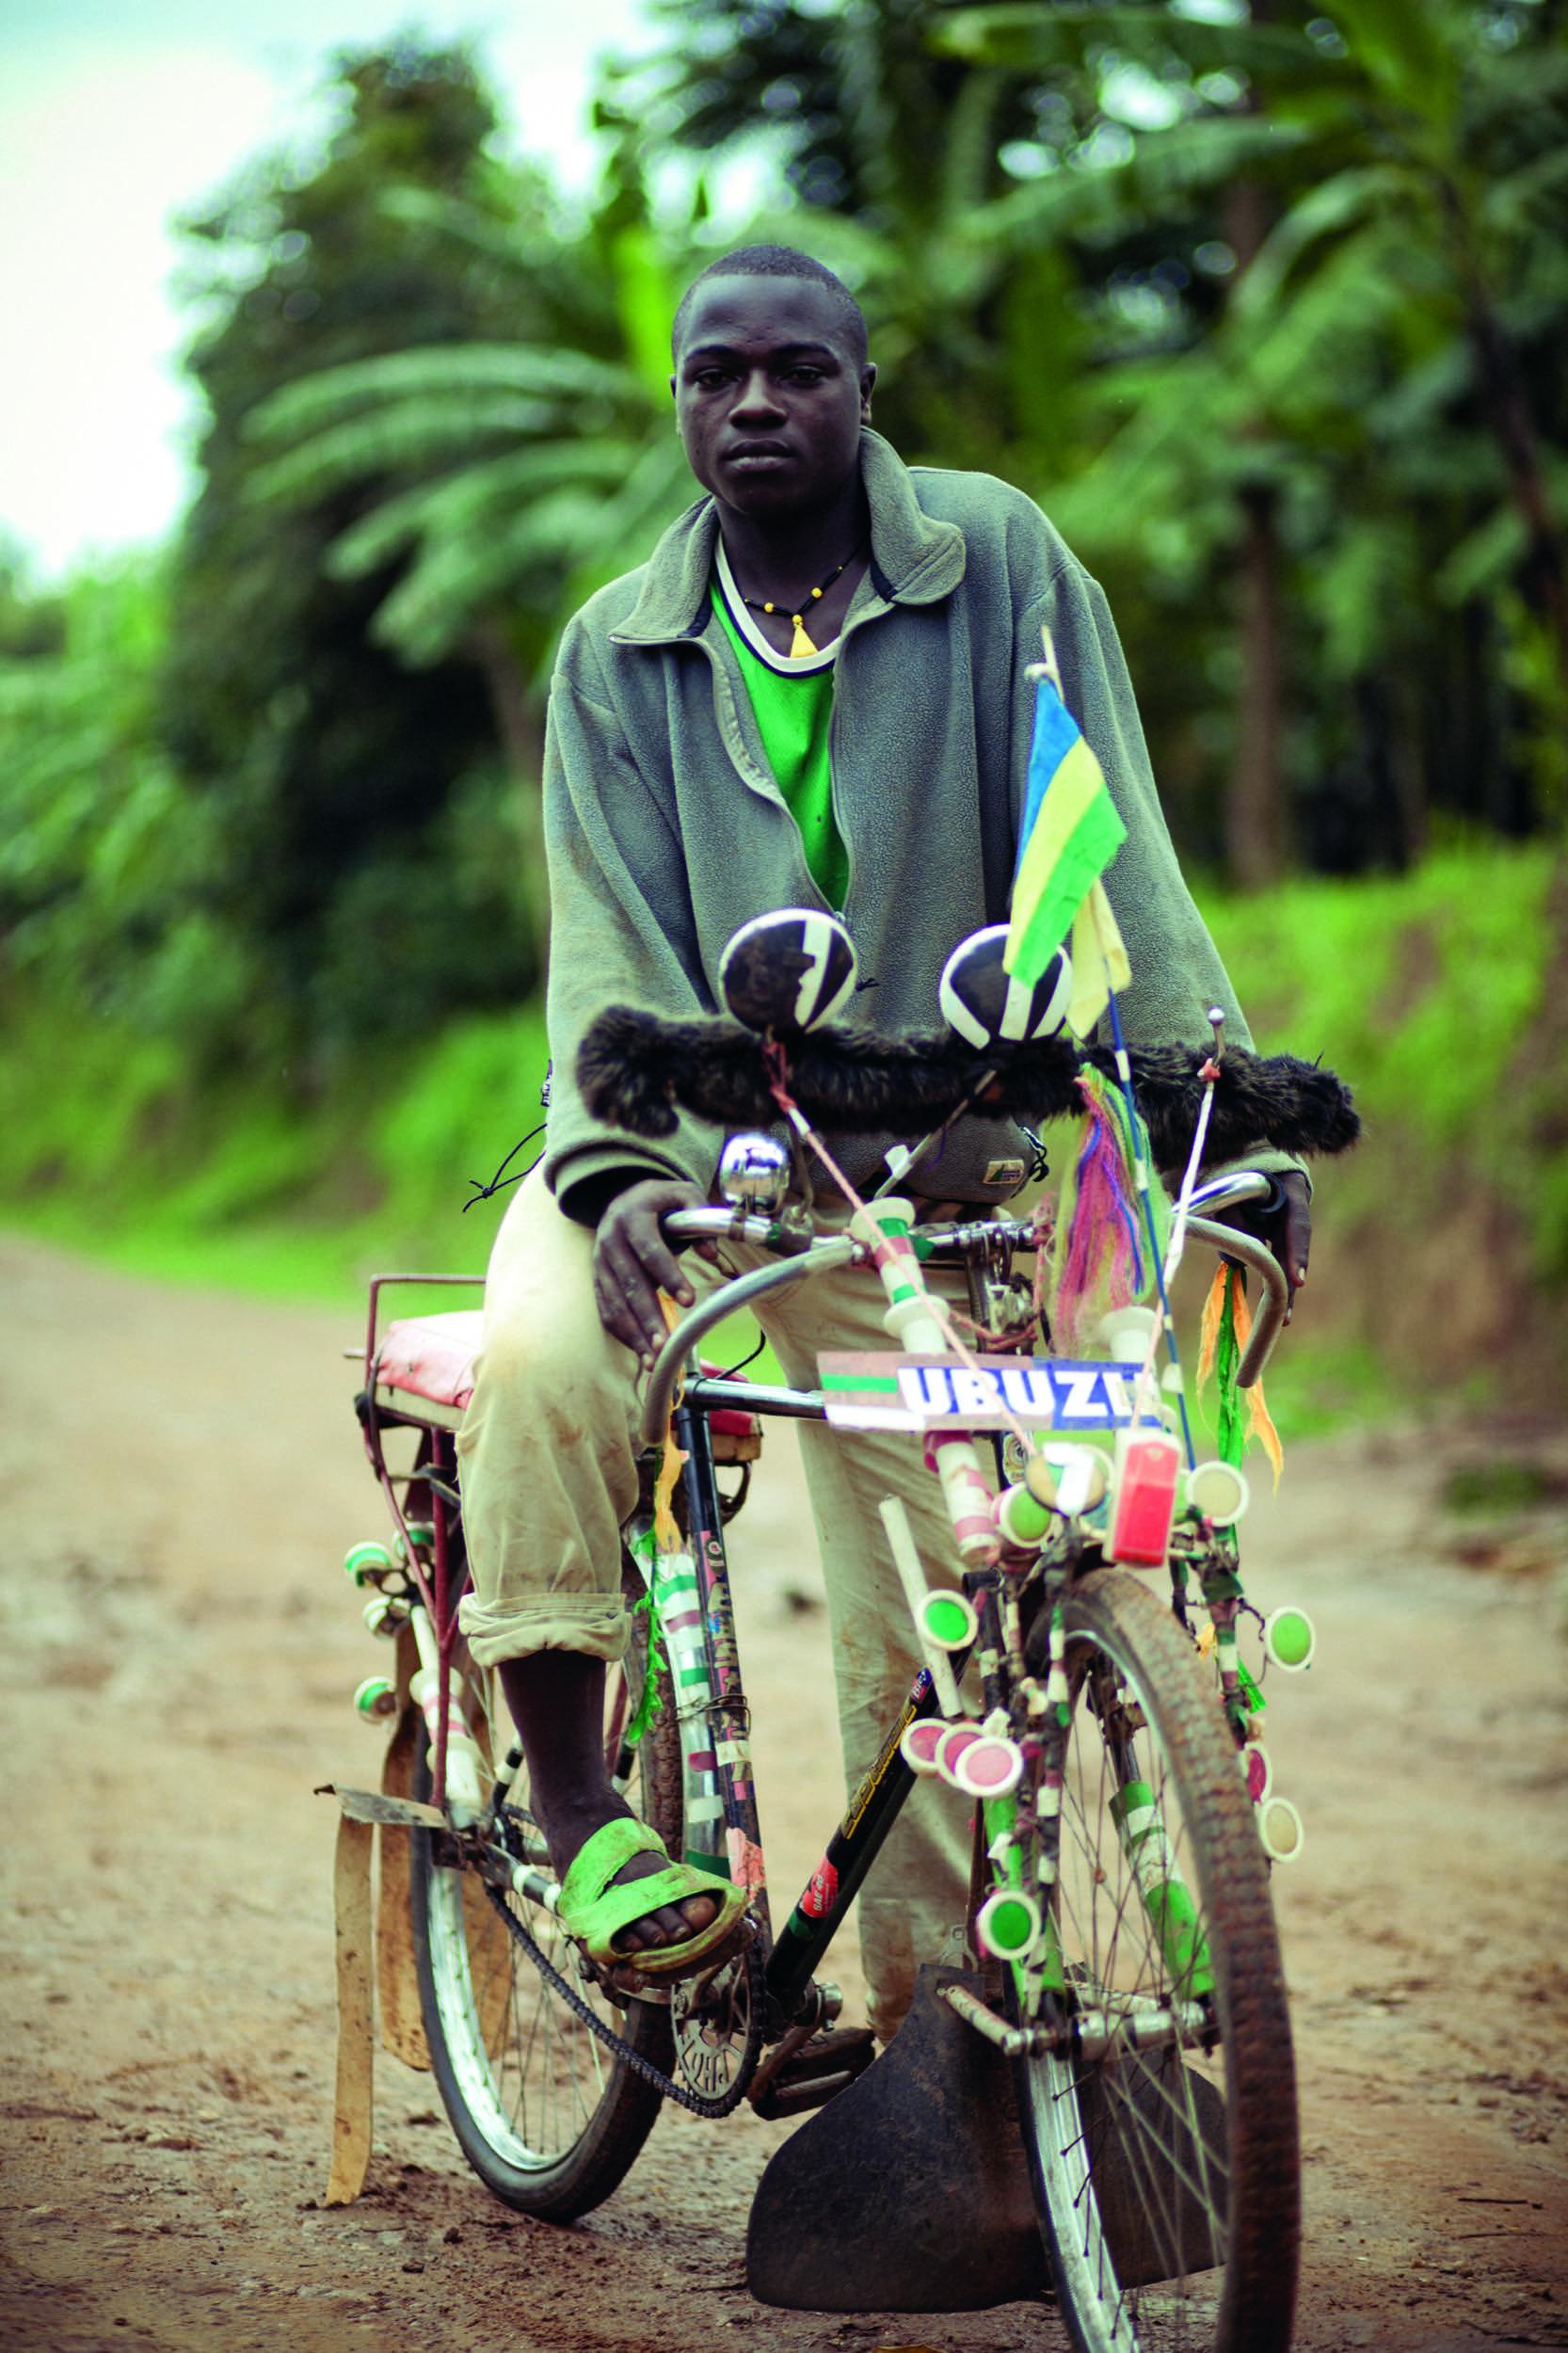 Minawi John, aged 19, on his customised pedicab. Nyamesheke District, Rwanda